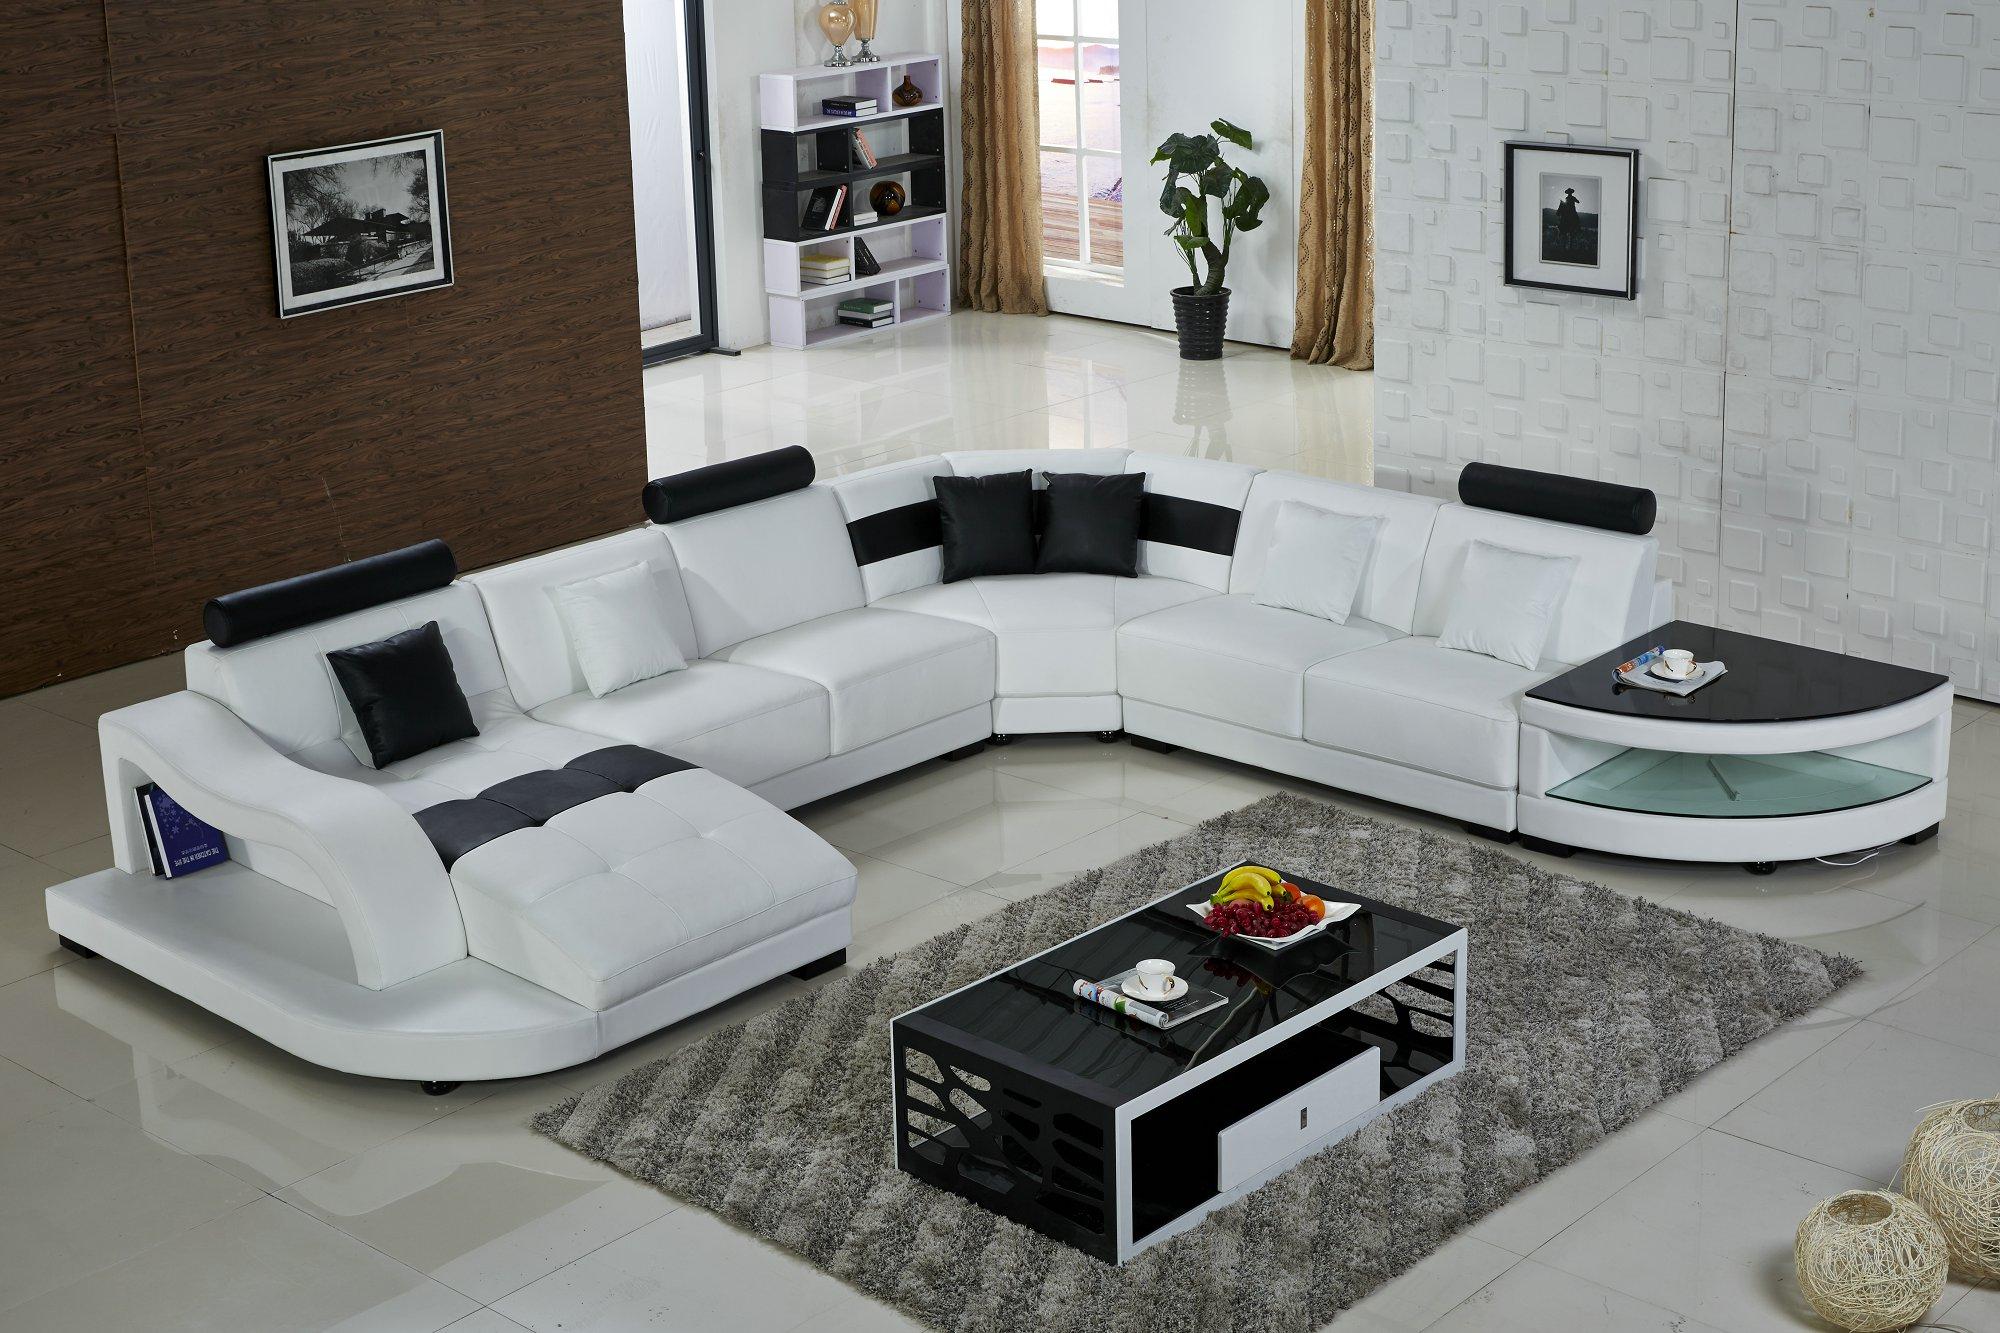 U K Home Living Room Furniture Leather Sofa H2217 Leather Sofa